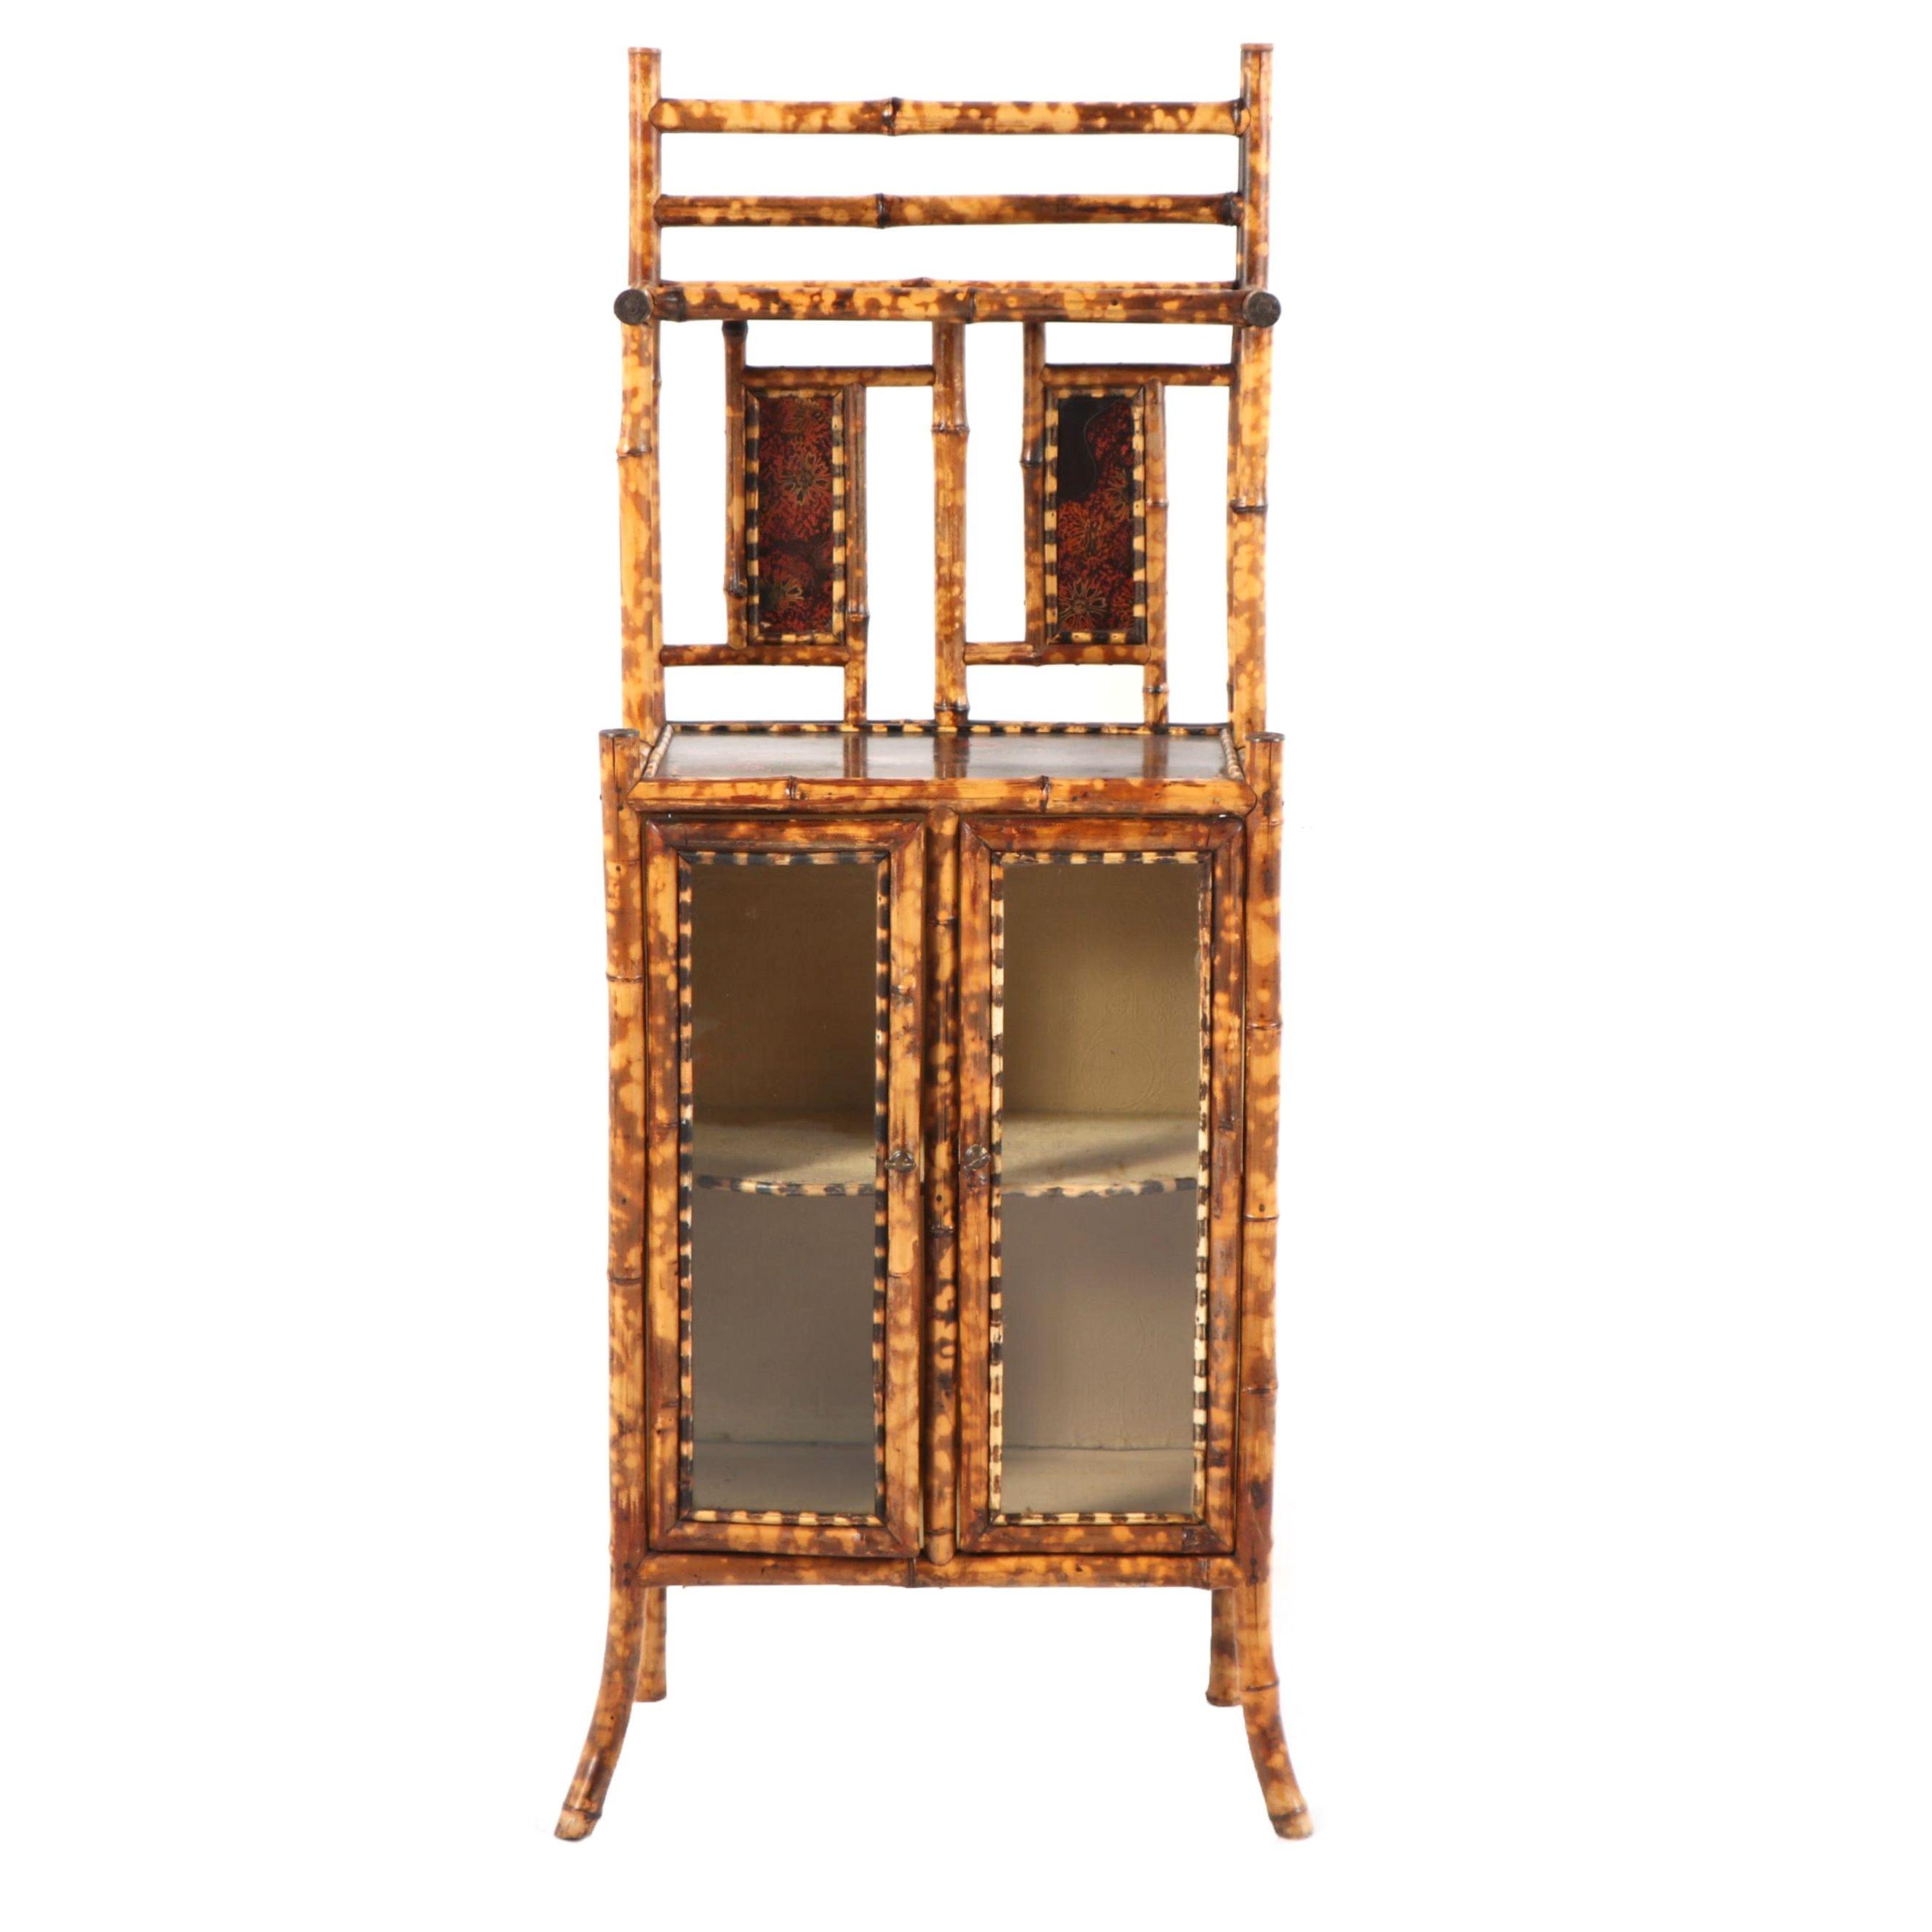 Bamboo Cabinet with Ledge Shelf